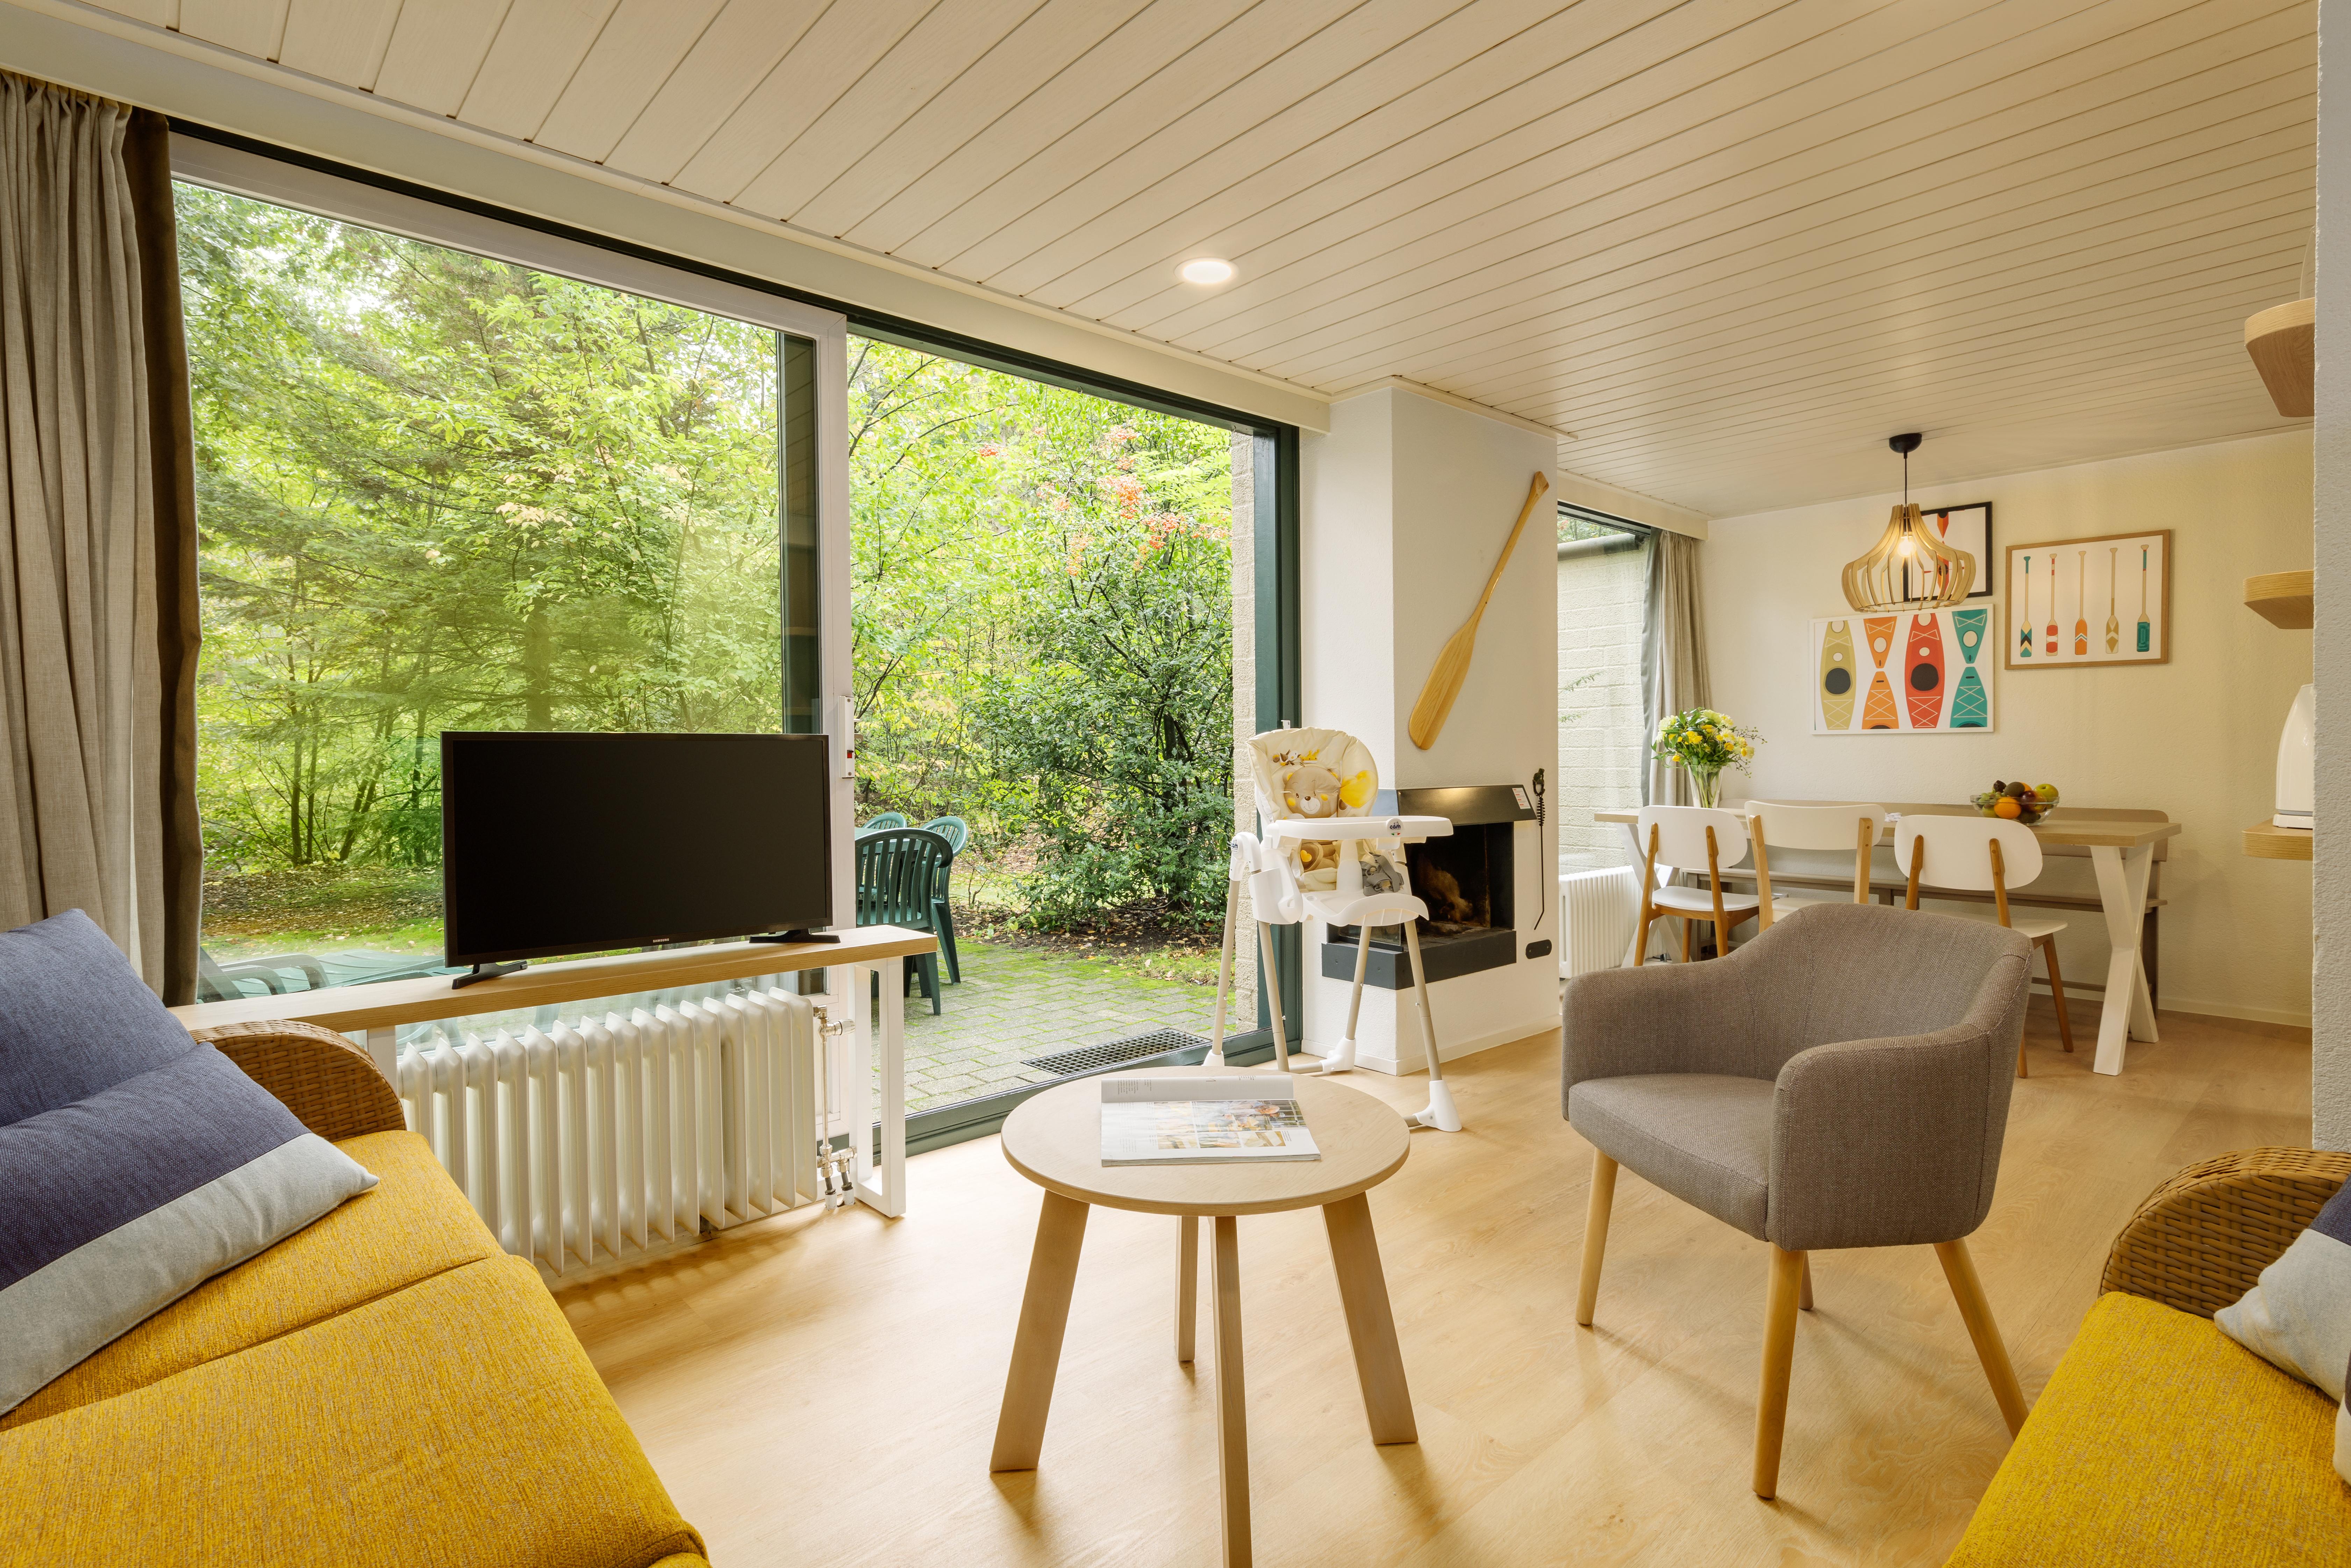 Ferienhaus Center Parcs Het Heijderbos - cottage Comfort 6 persons (2785490), Heijen, Noord-Limburg, Limburg (NL), Niederlande, Bild 2